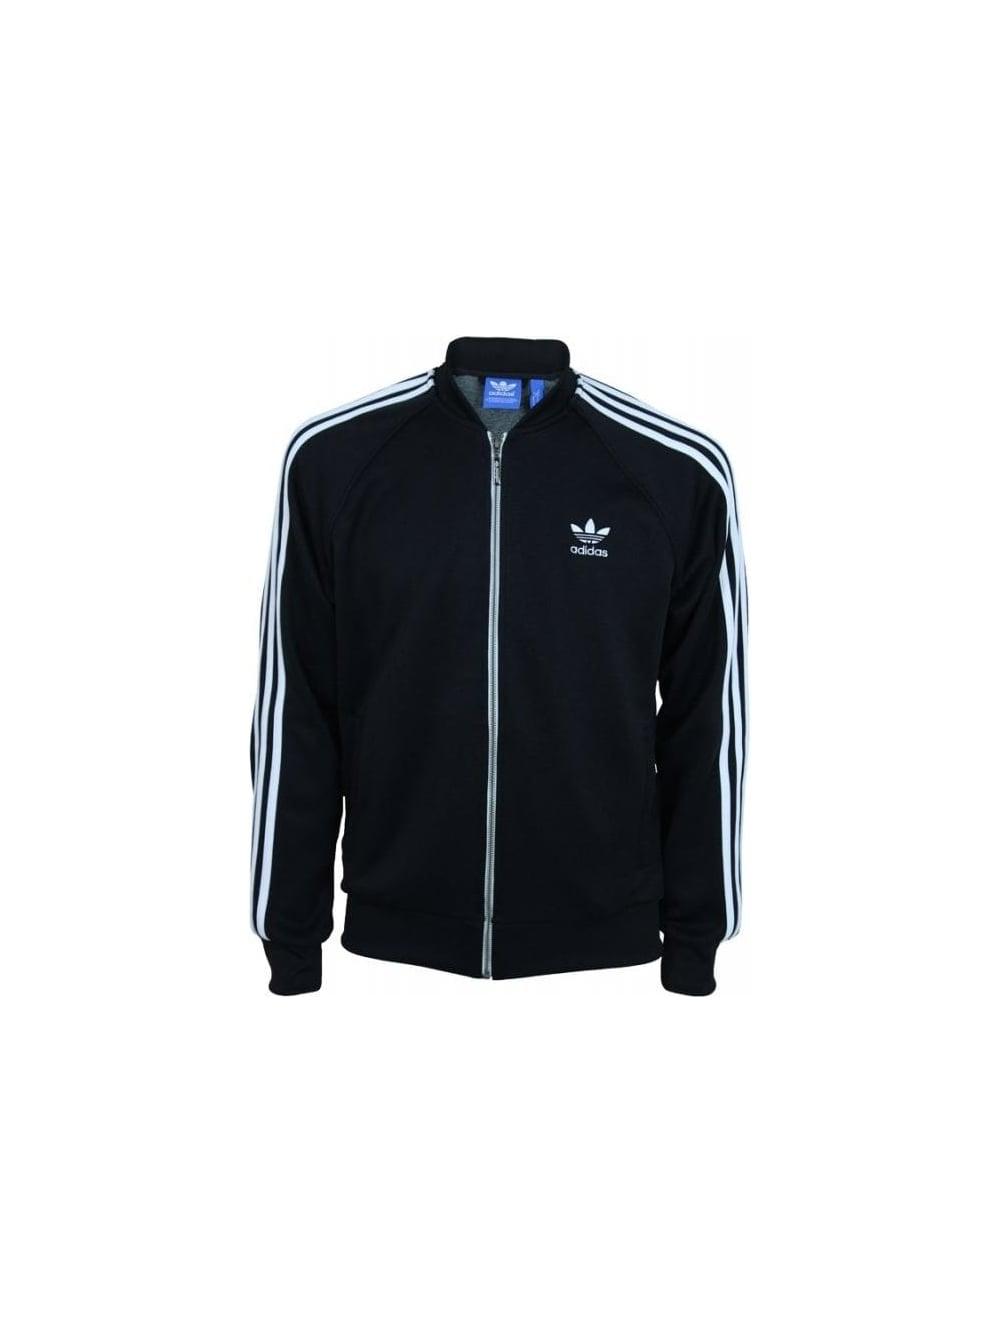 adidas originals superstar track jacket ab9717, adidas